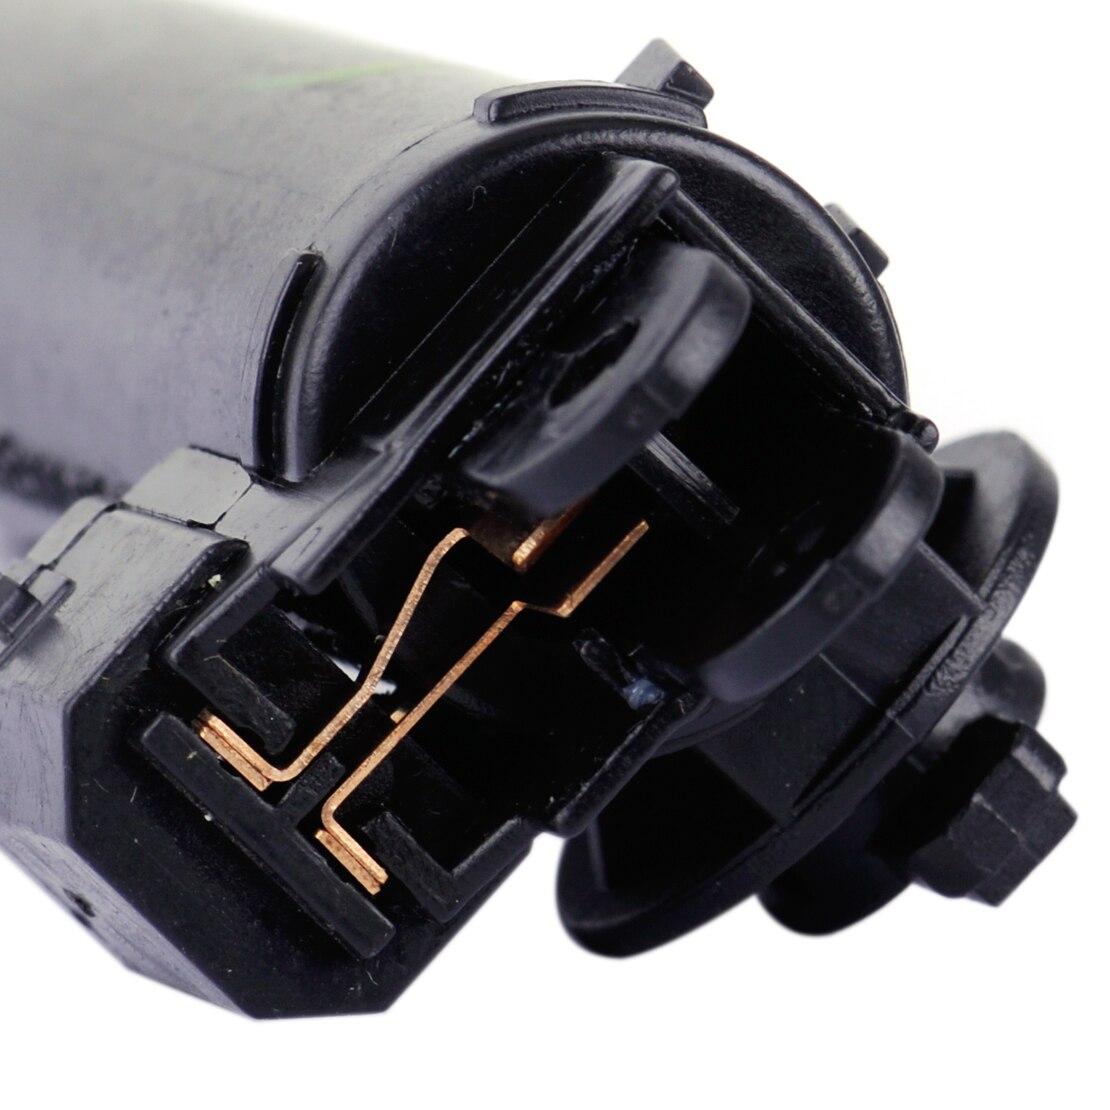 rolha amortecedor freio elemento interruptor 8k1880324 apto para audi a4 a3 a5 q5